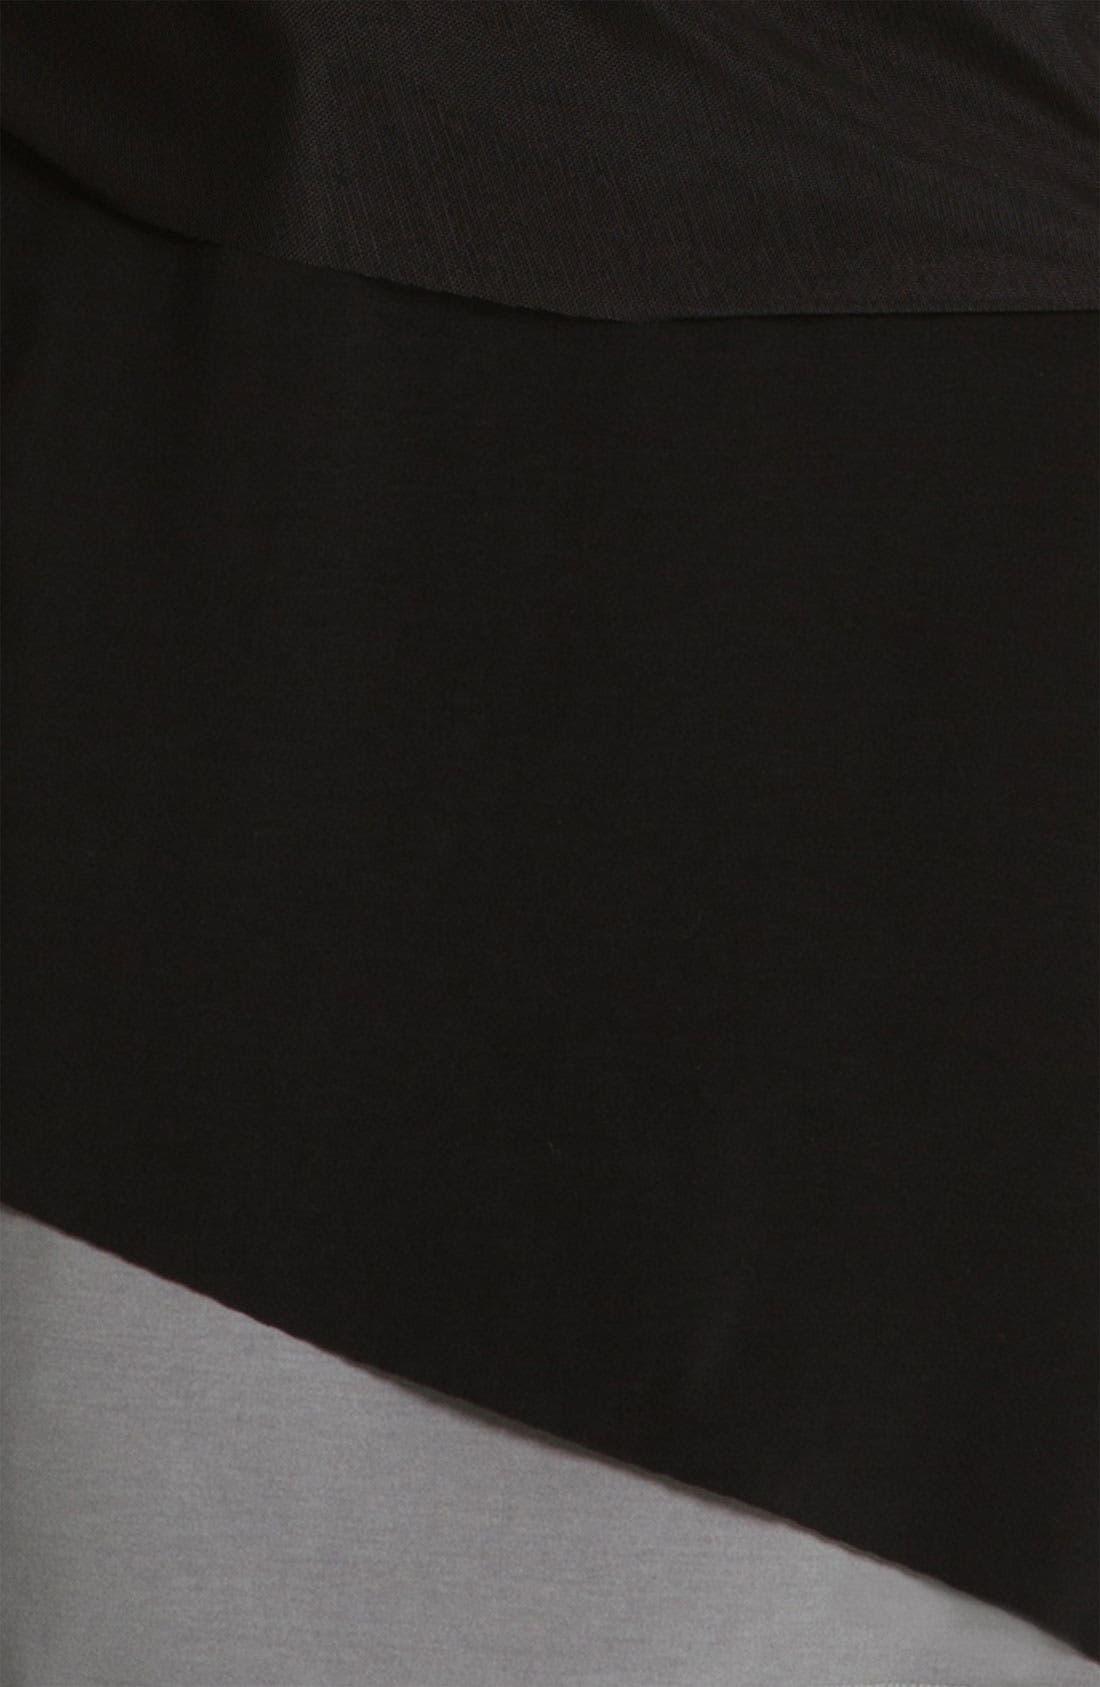 Alternate Image 3  - Alex & Ava Surplice Mesh & Jersey Dress (Petite)